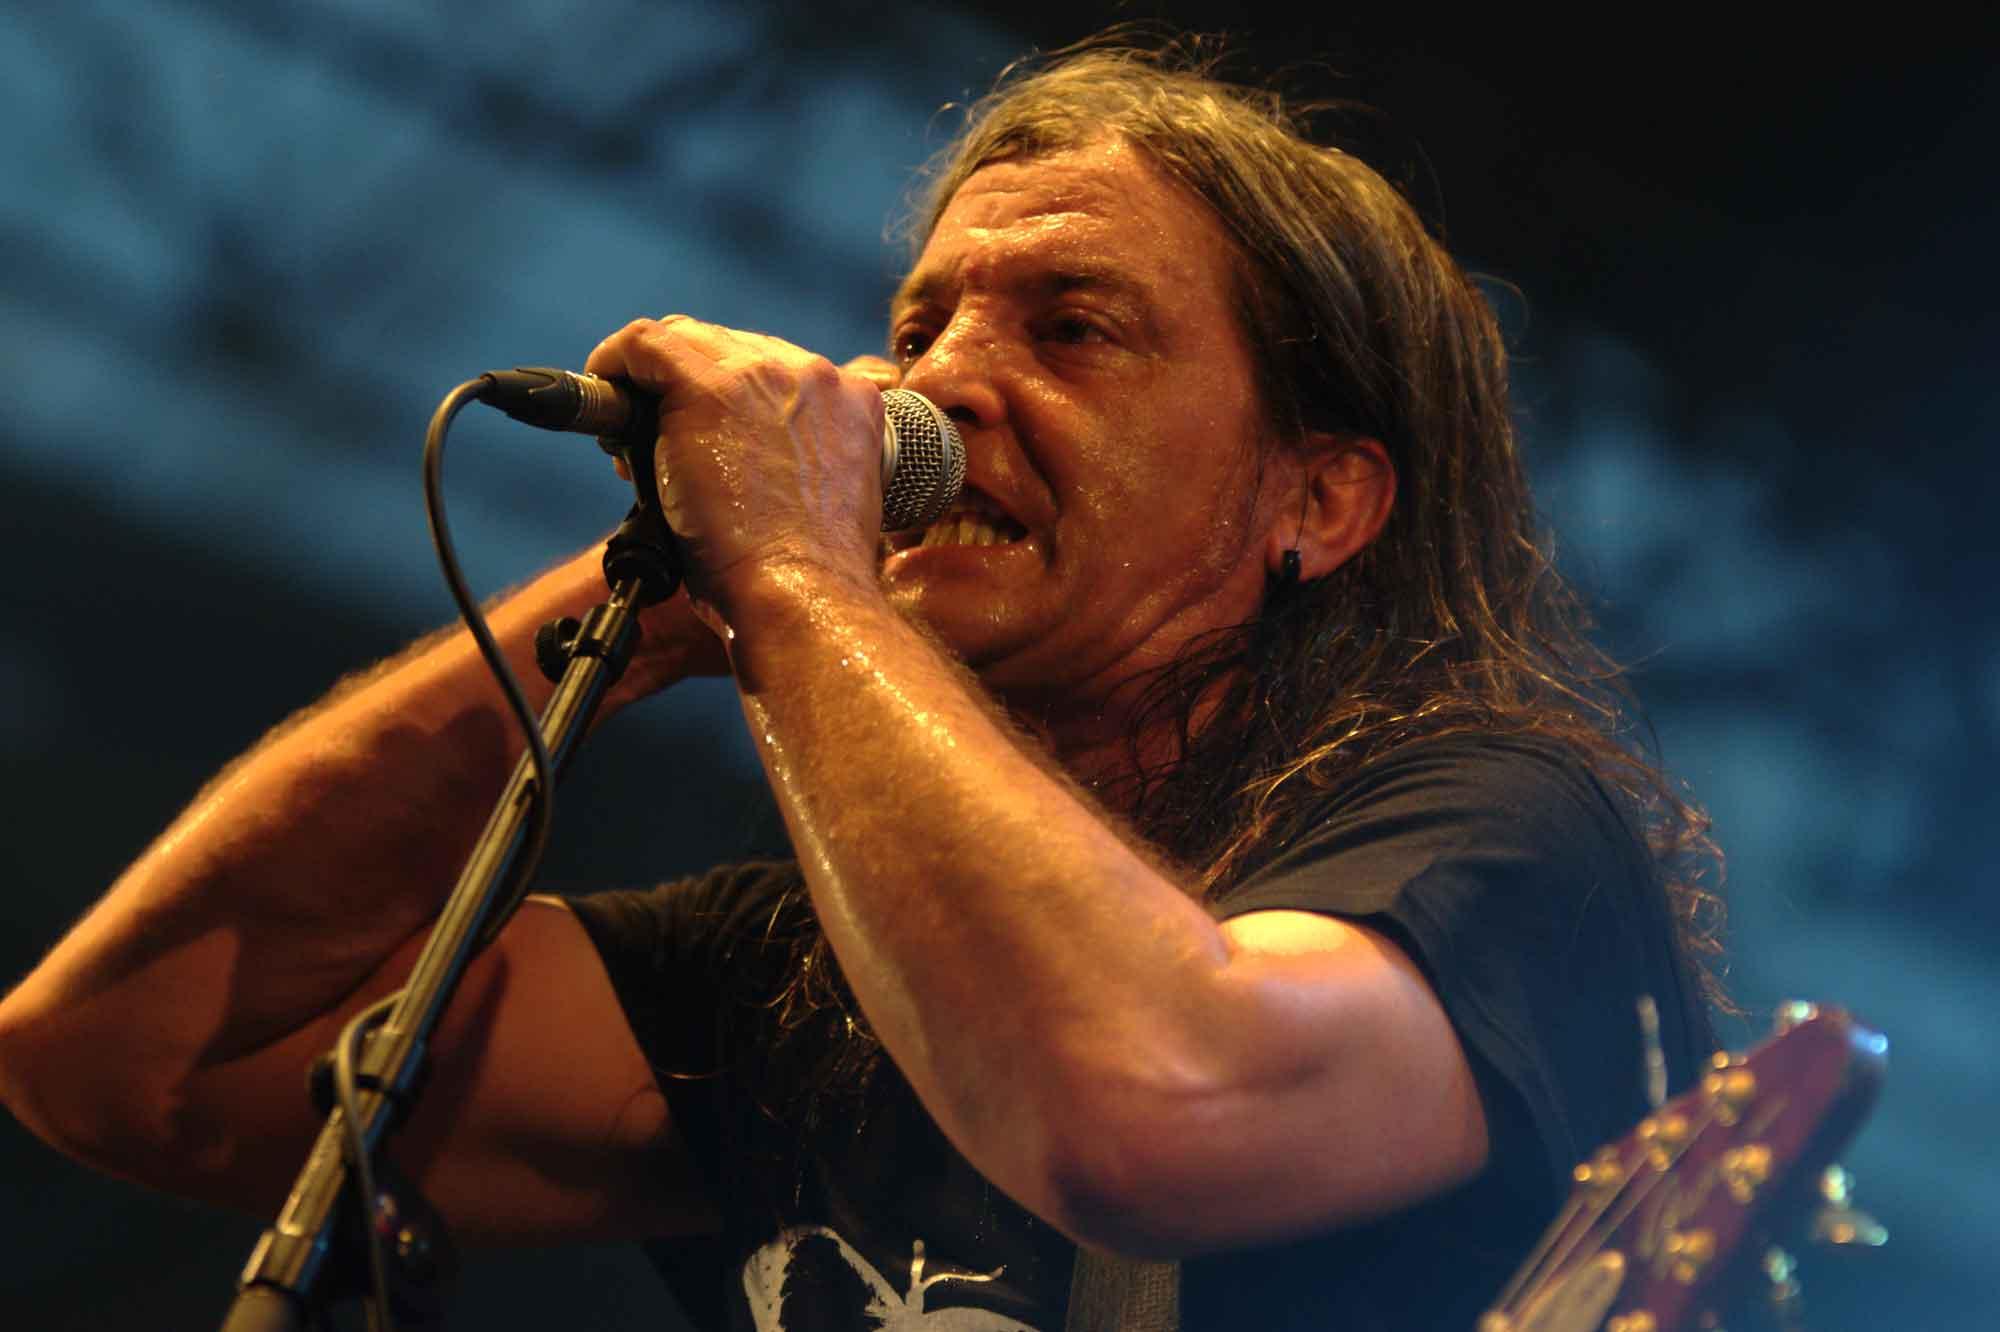 Mor Boni, guitarrista de Barricada